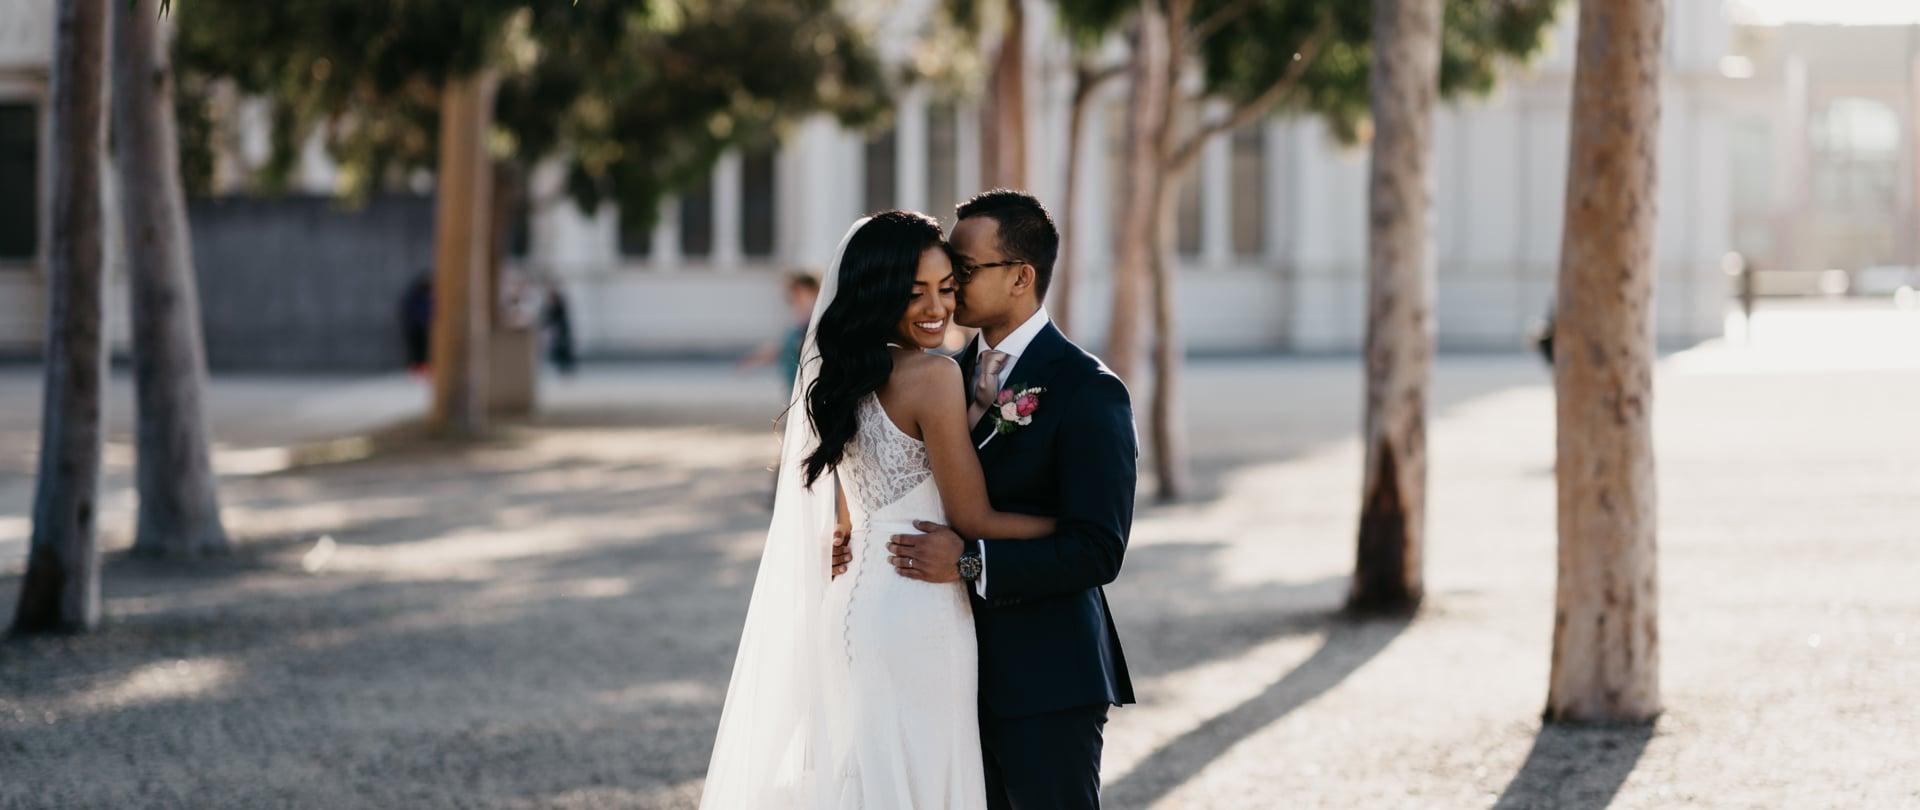 Benita & Rohit Wedding Video Filmed at Melbourne, Victoria